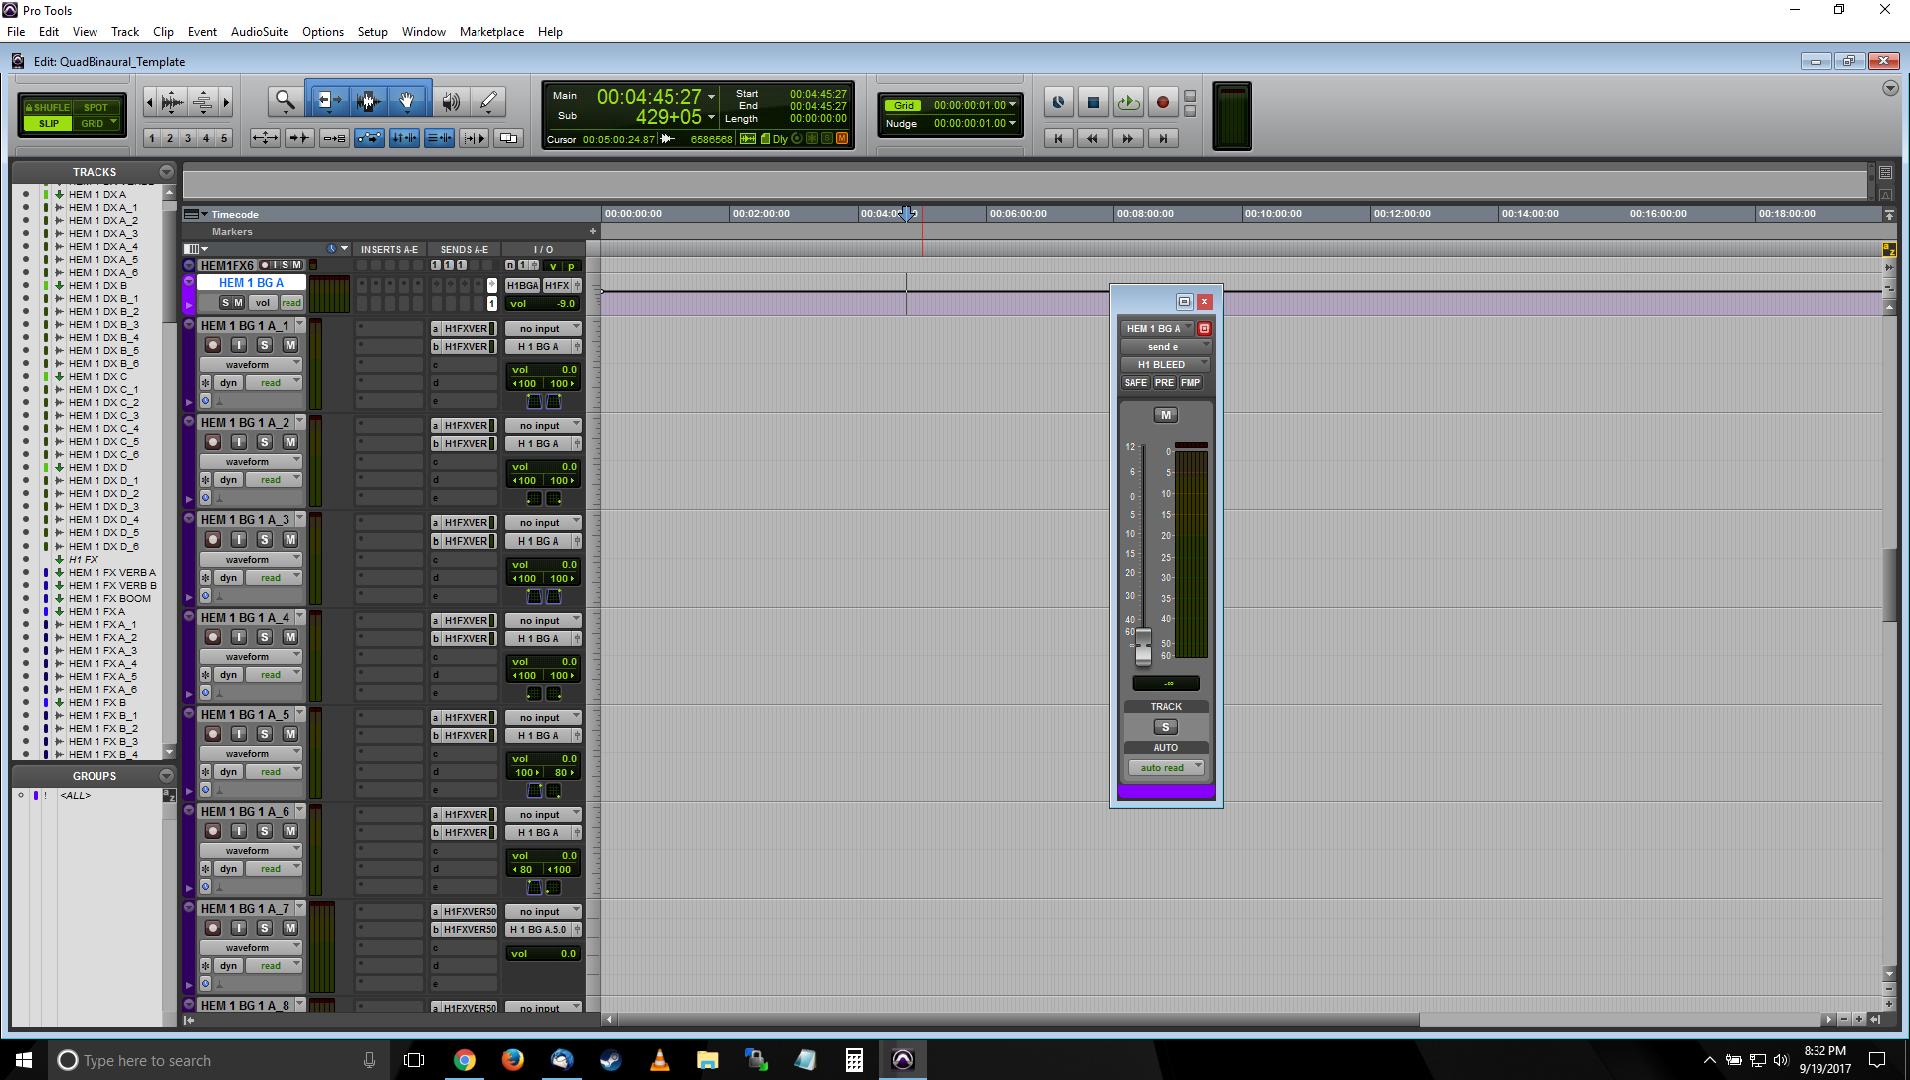 A screenshot of Pro Tools showing the BG predub